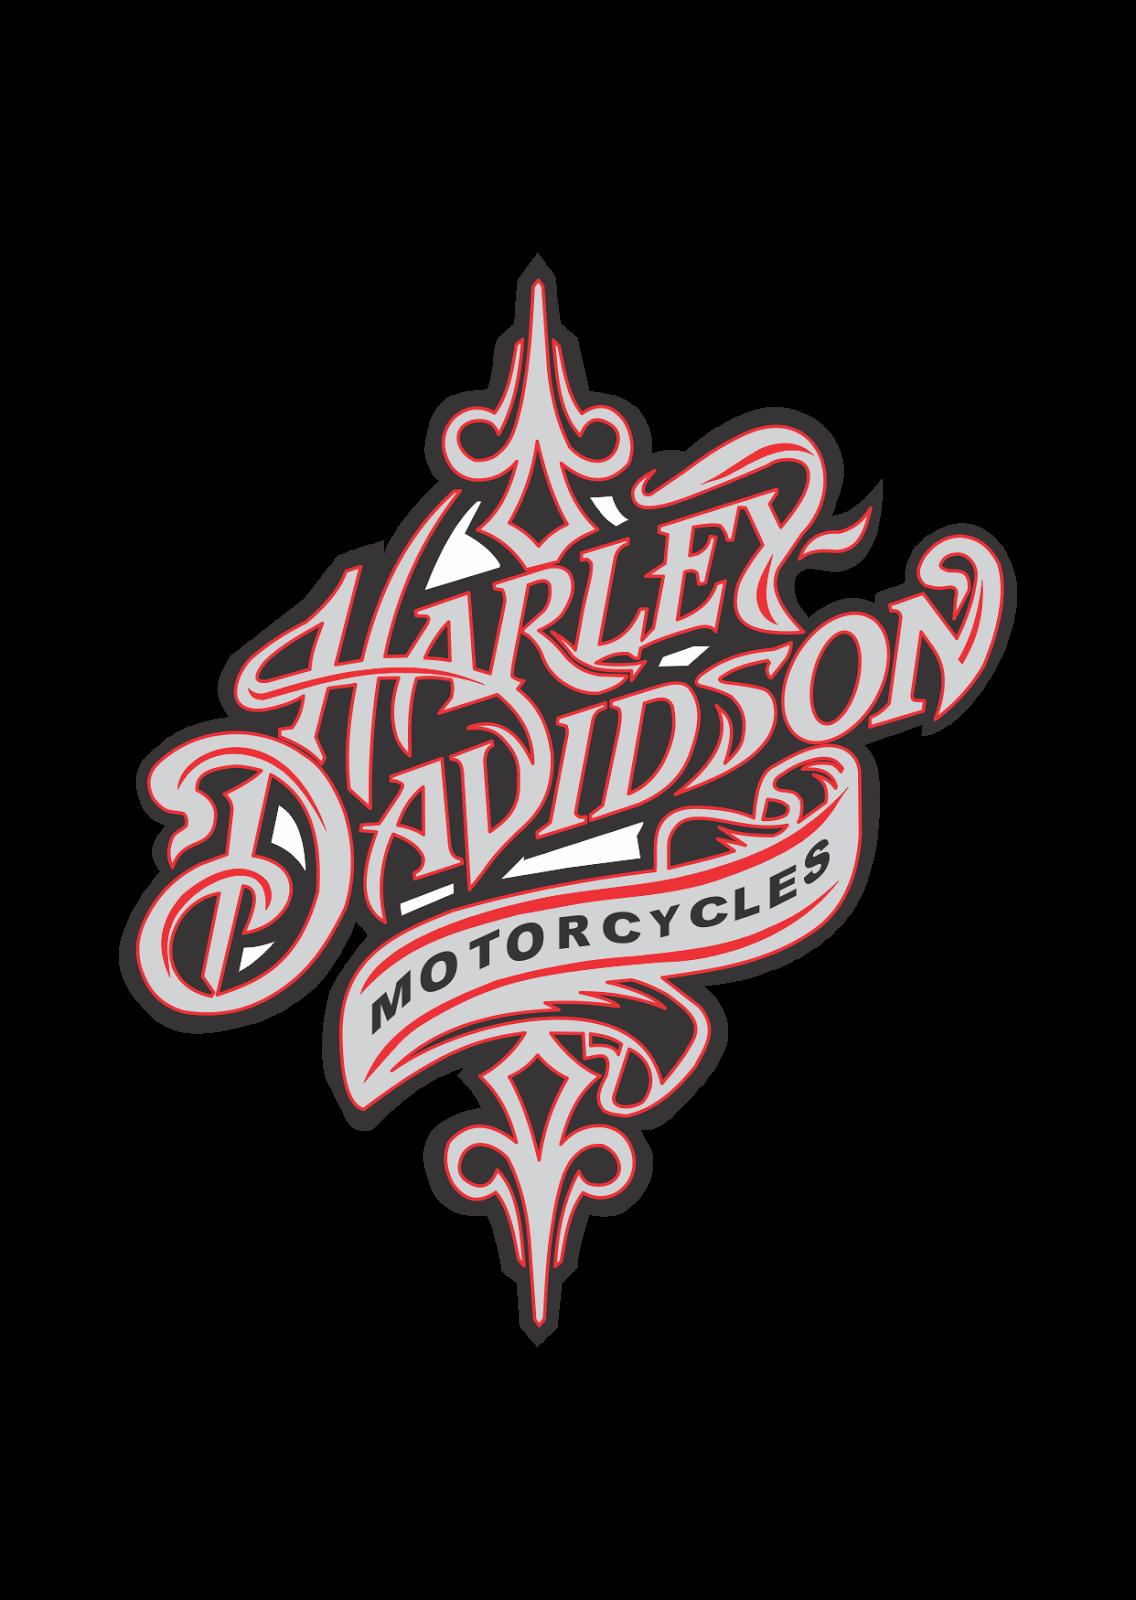 Harley Davidson Motorcycles Logo Vector Motorcycle